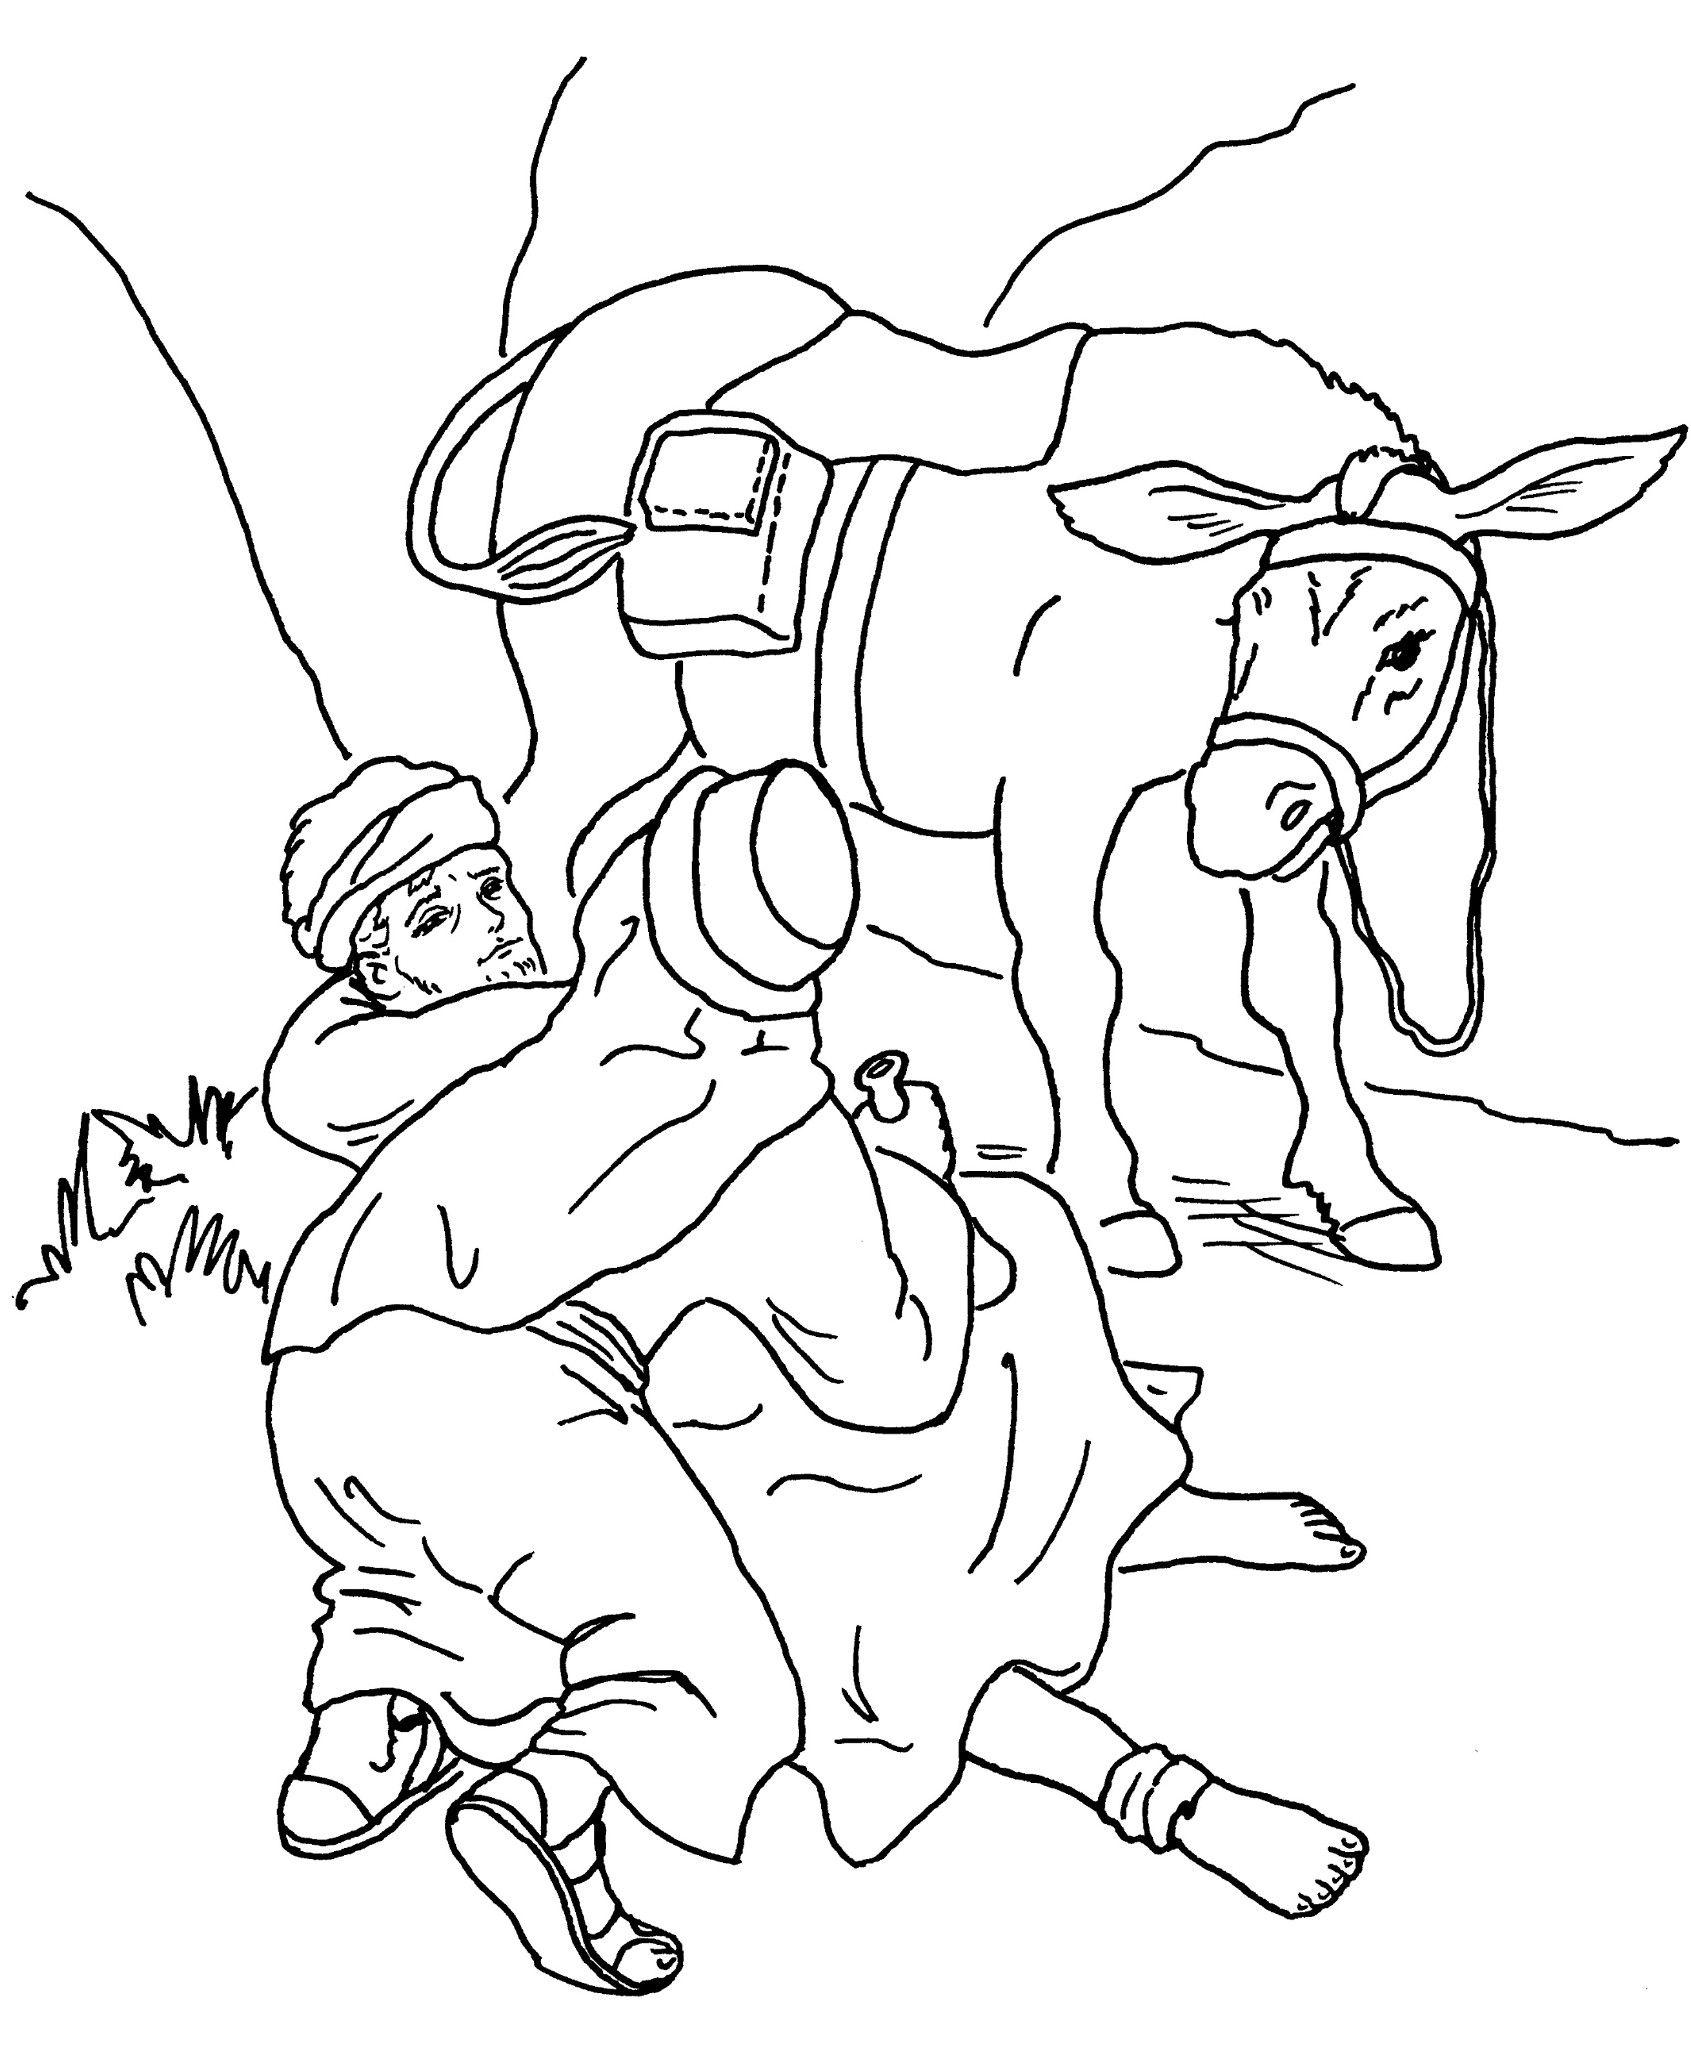 the good samaritan the good samaritan pinterest sunday school - Good Samaritan Coloring Page